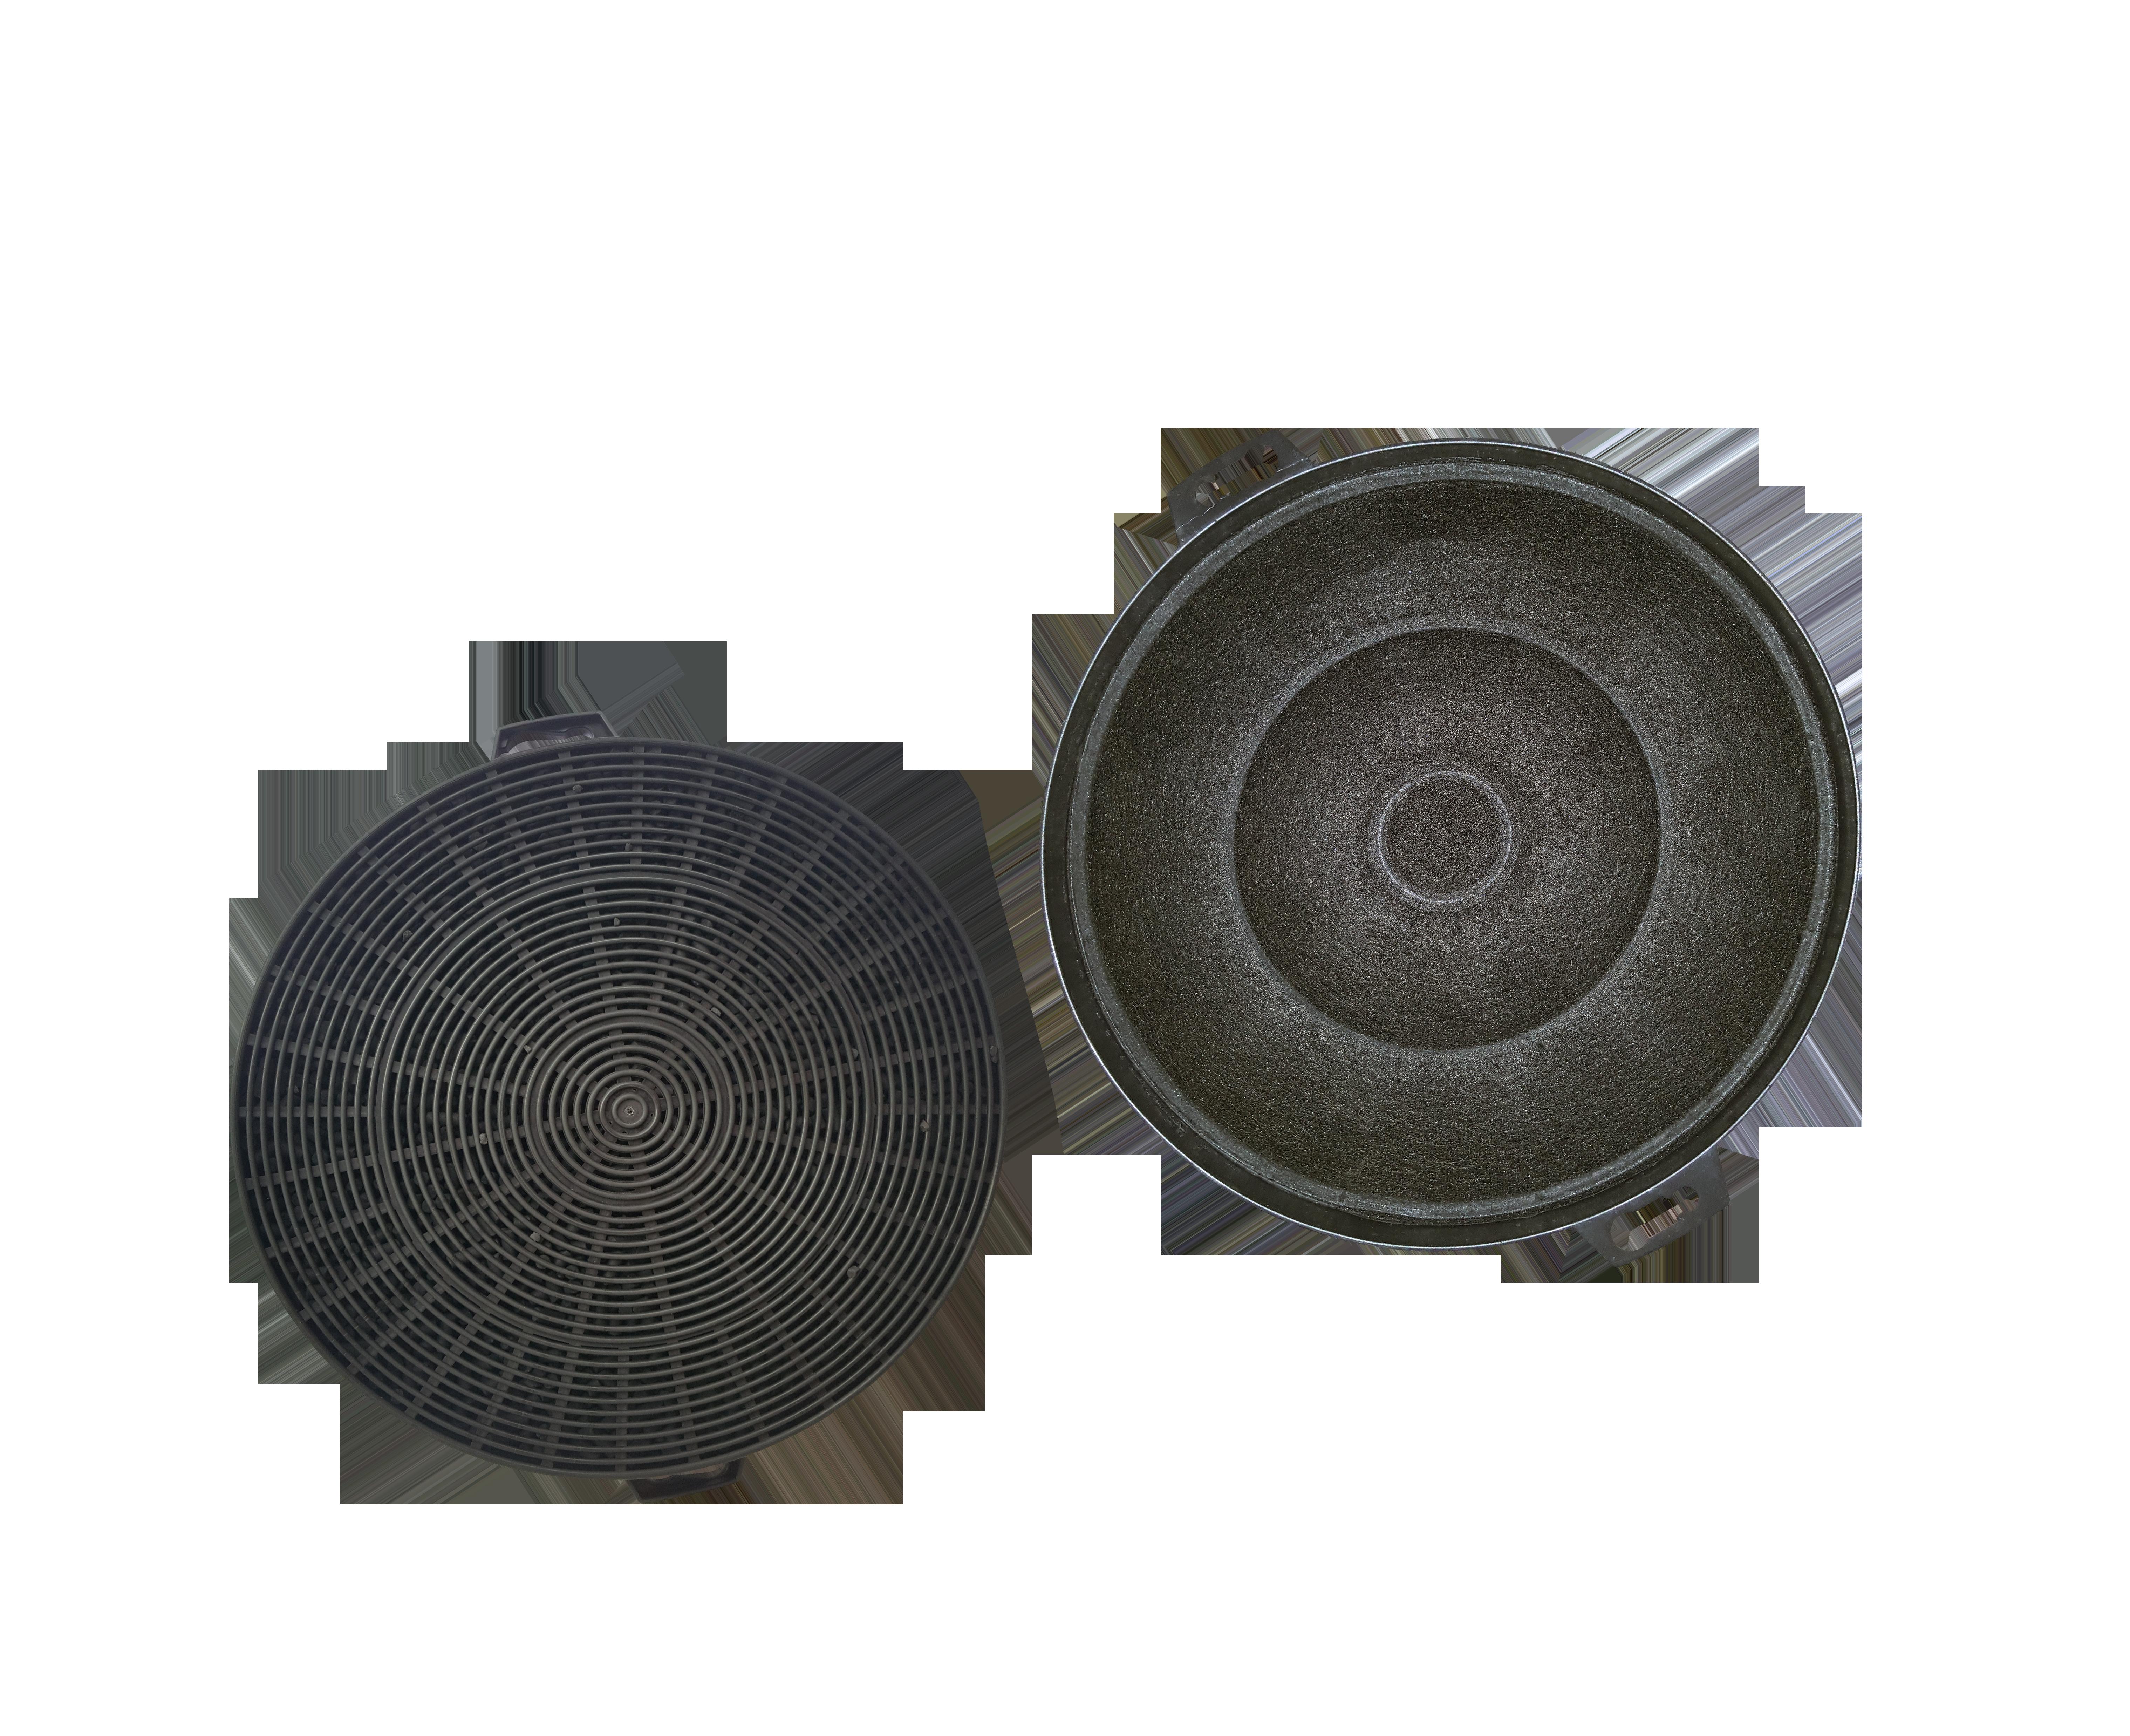 Juno dunstabzugshaube filter wechseln: dunstabzugshaube filter